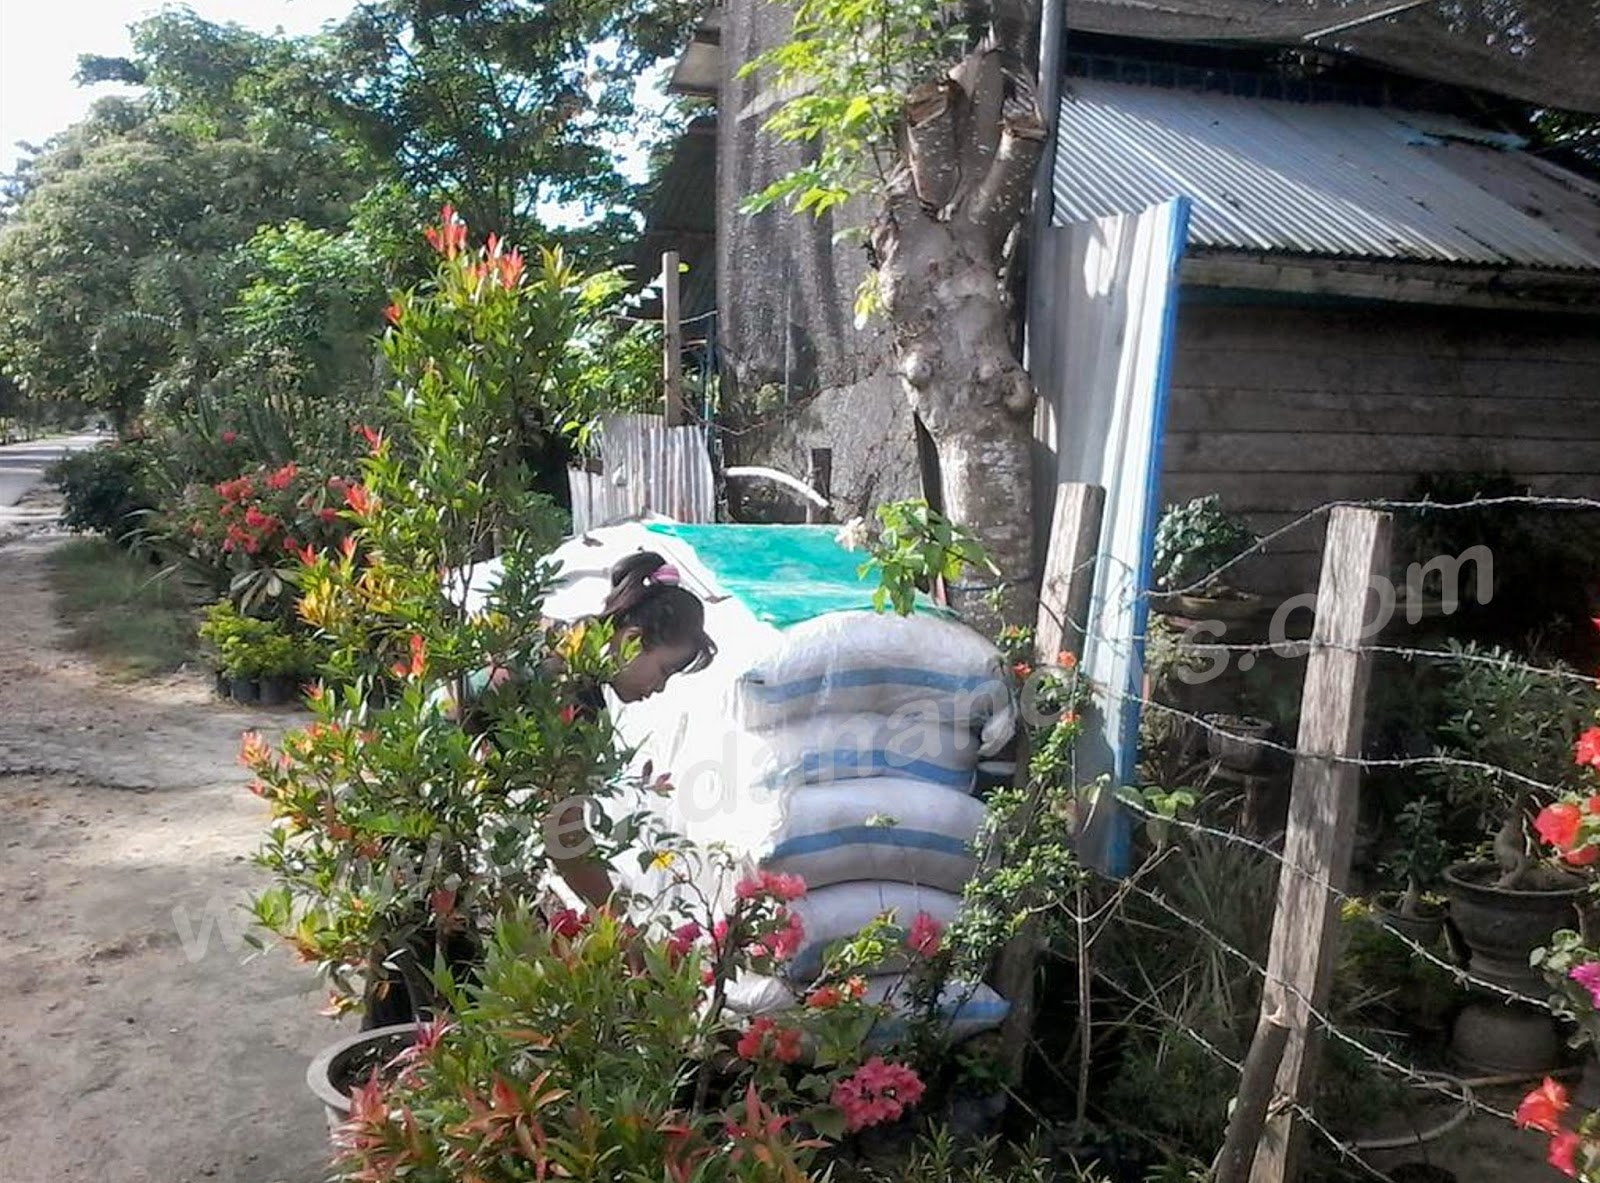 Penyebab Harga Tanaman Hias Kendari Mahal Cendana News Cendananews Sulawesi